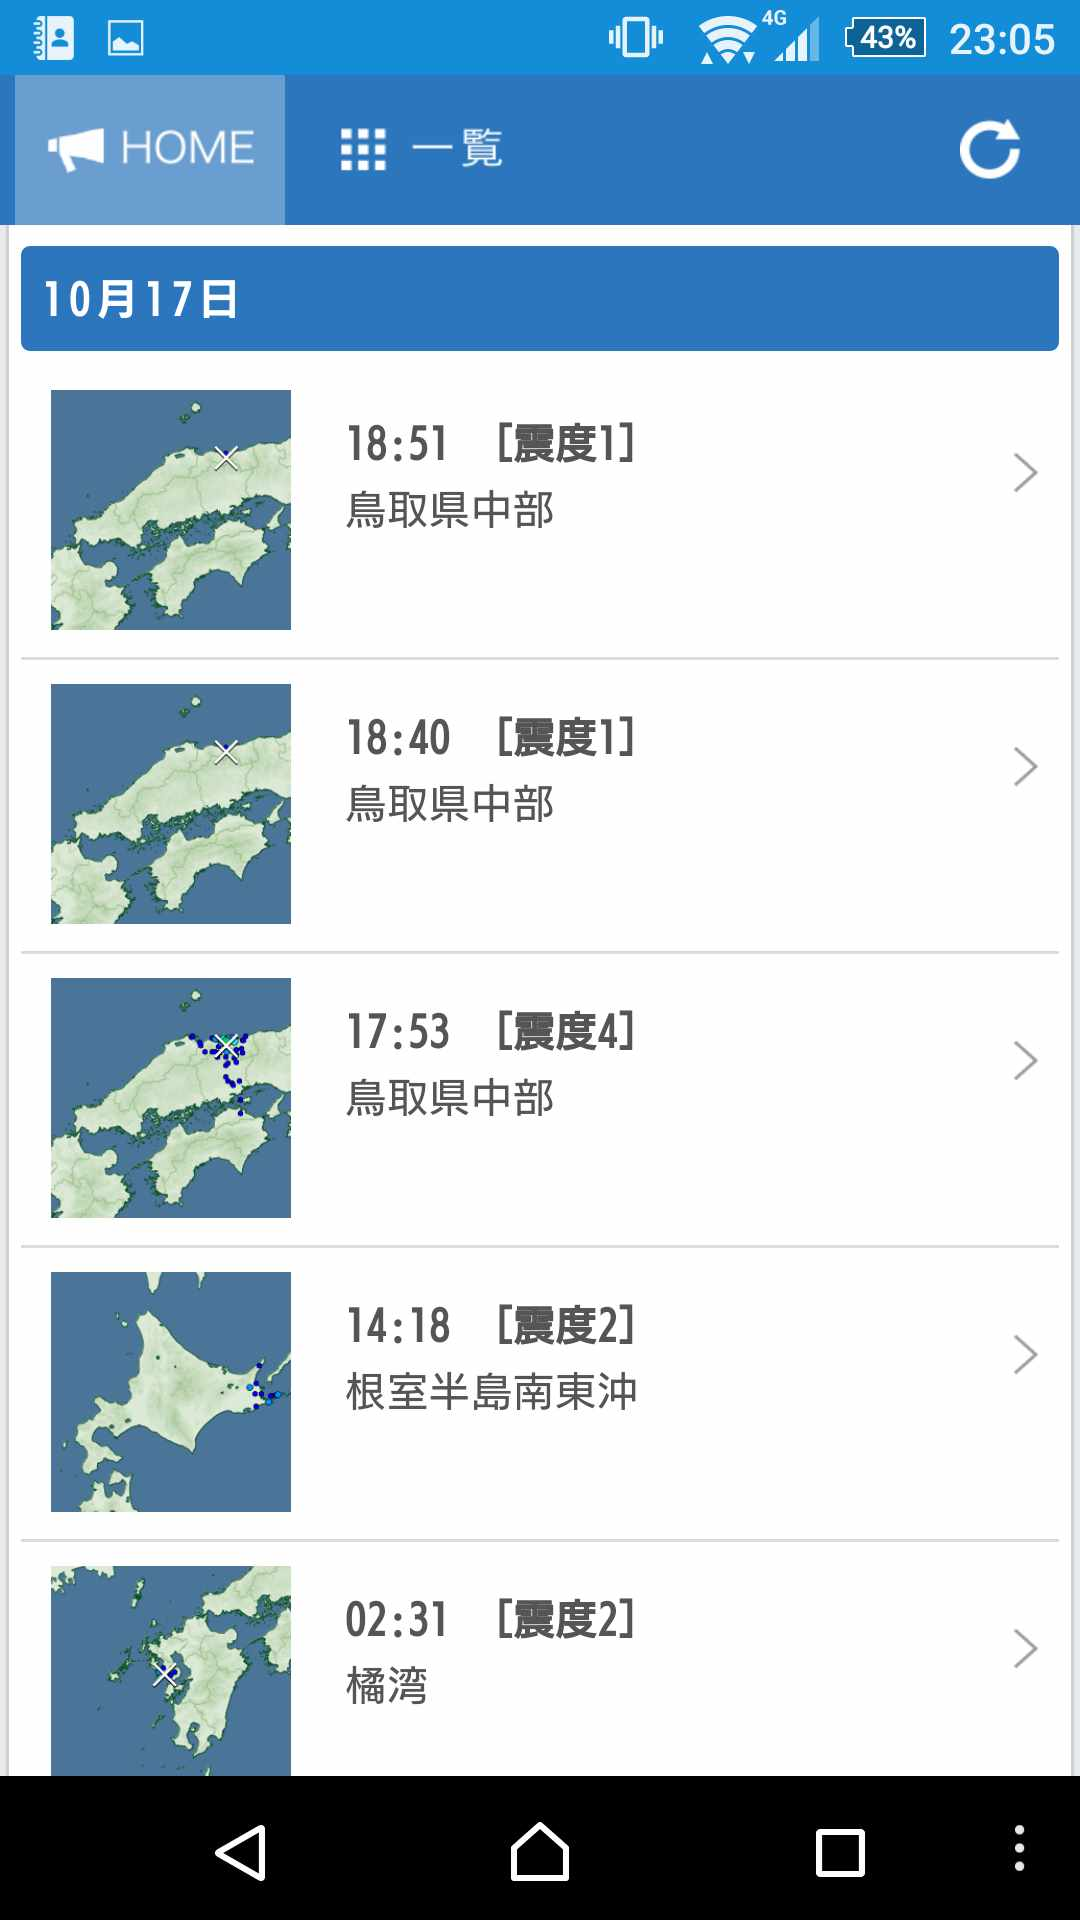 http://blog-imgs-81.fc2.com/o/k/a/okarutojishinyogen/news4vip_1445263860_104.jpg